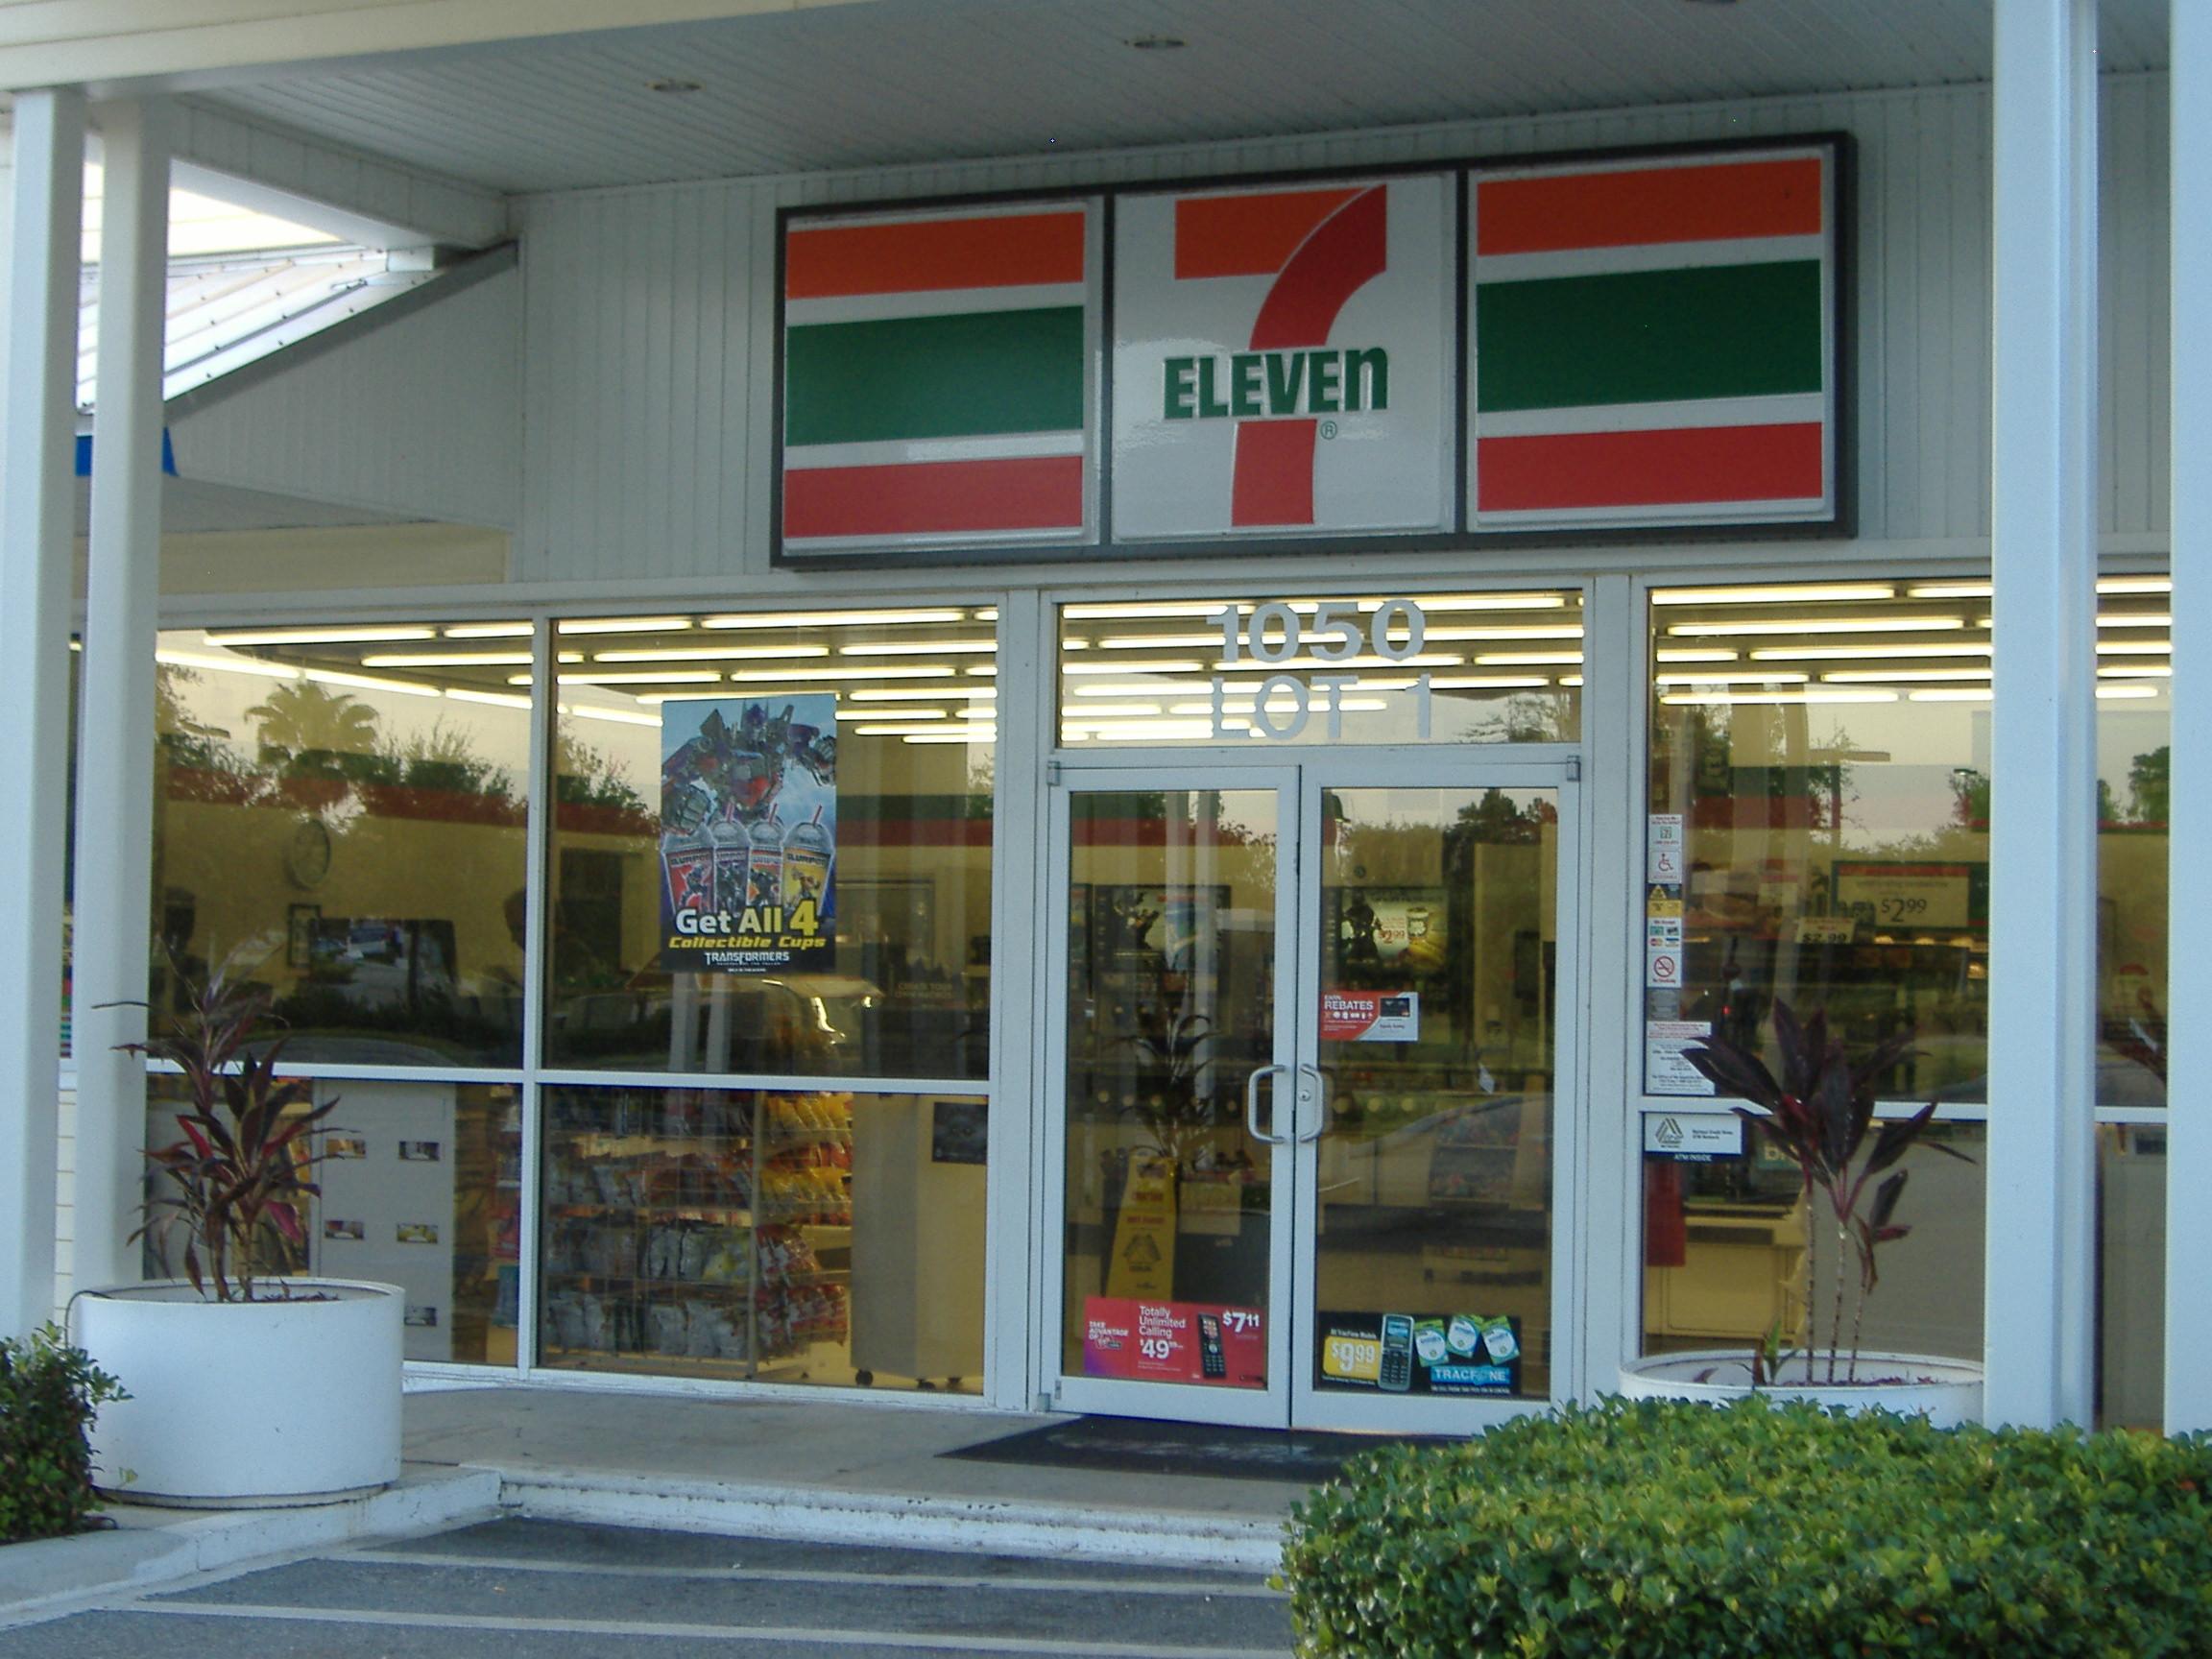 7-11 Bobcat Convenience - Gas Station 1.